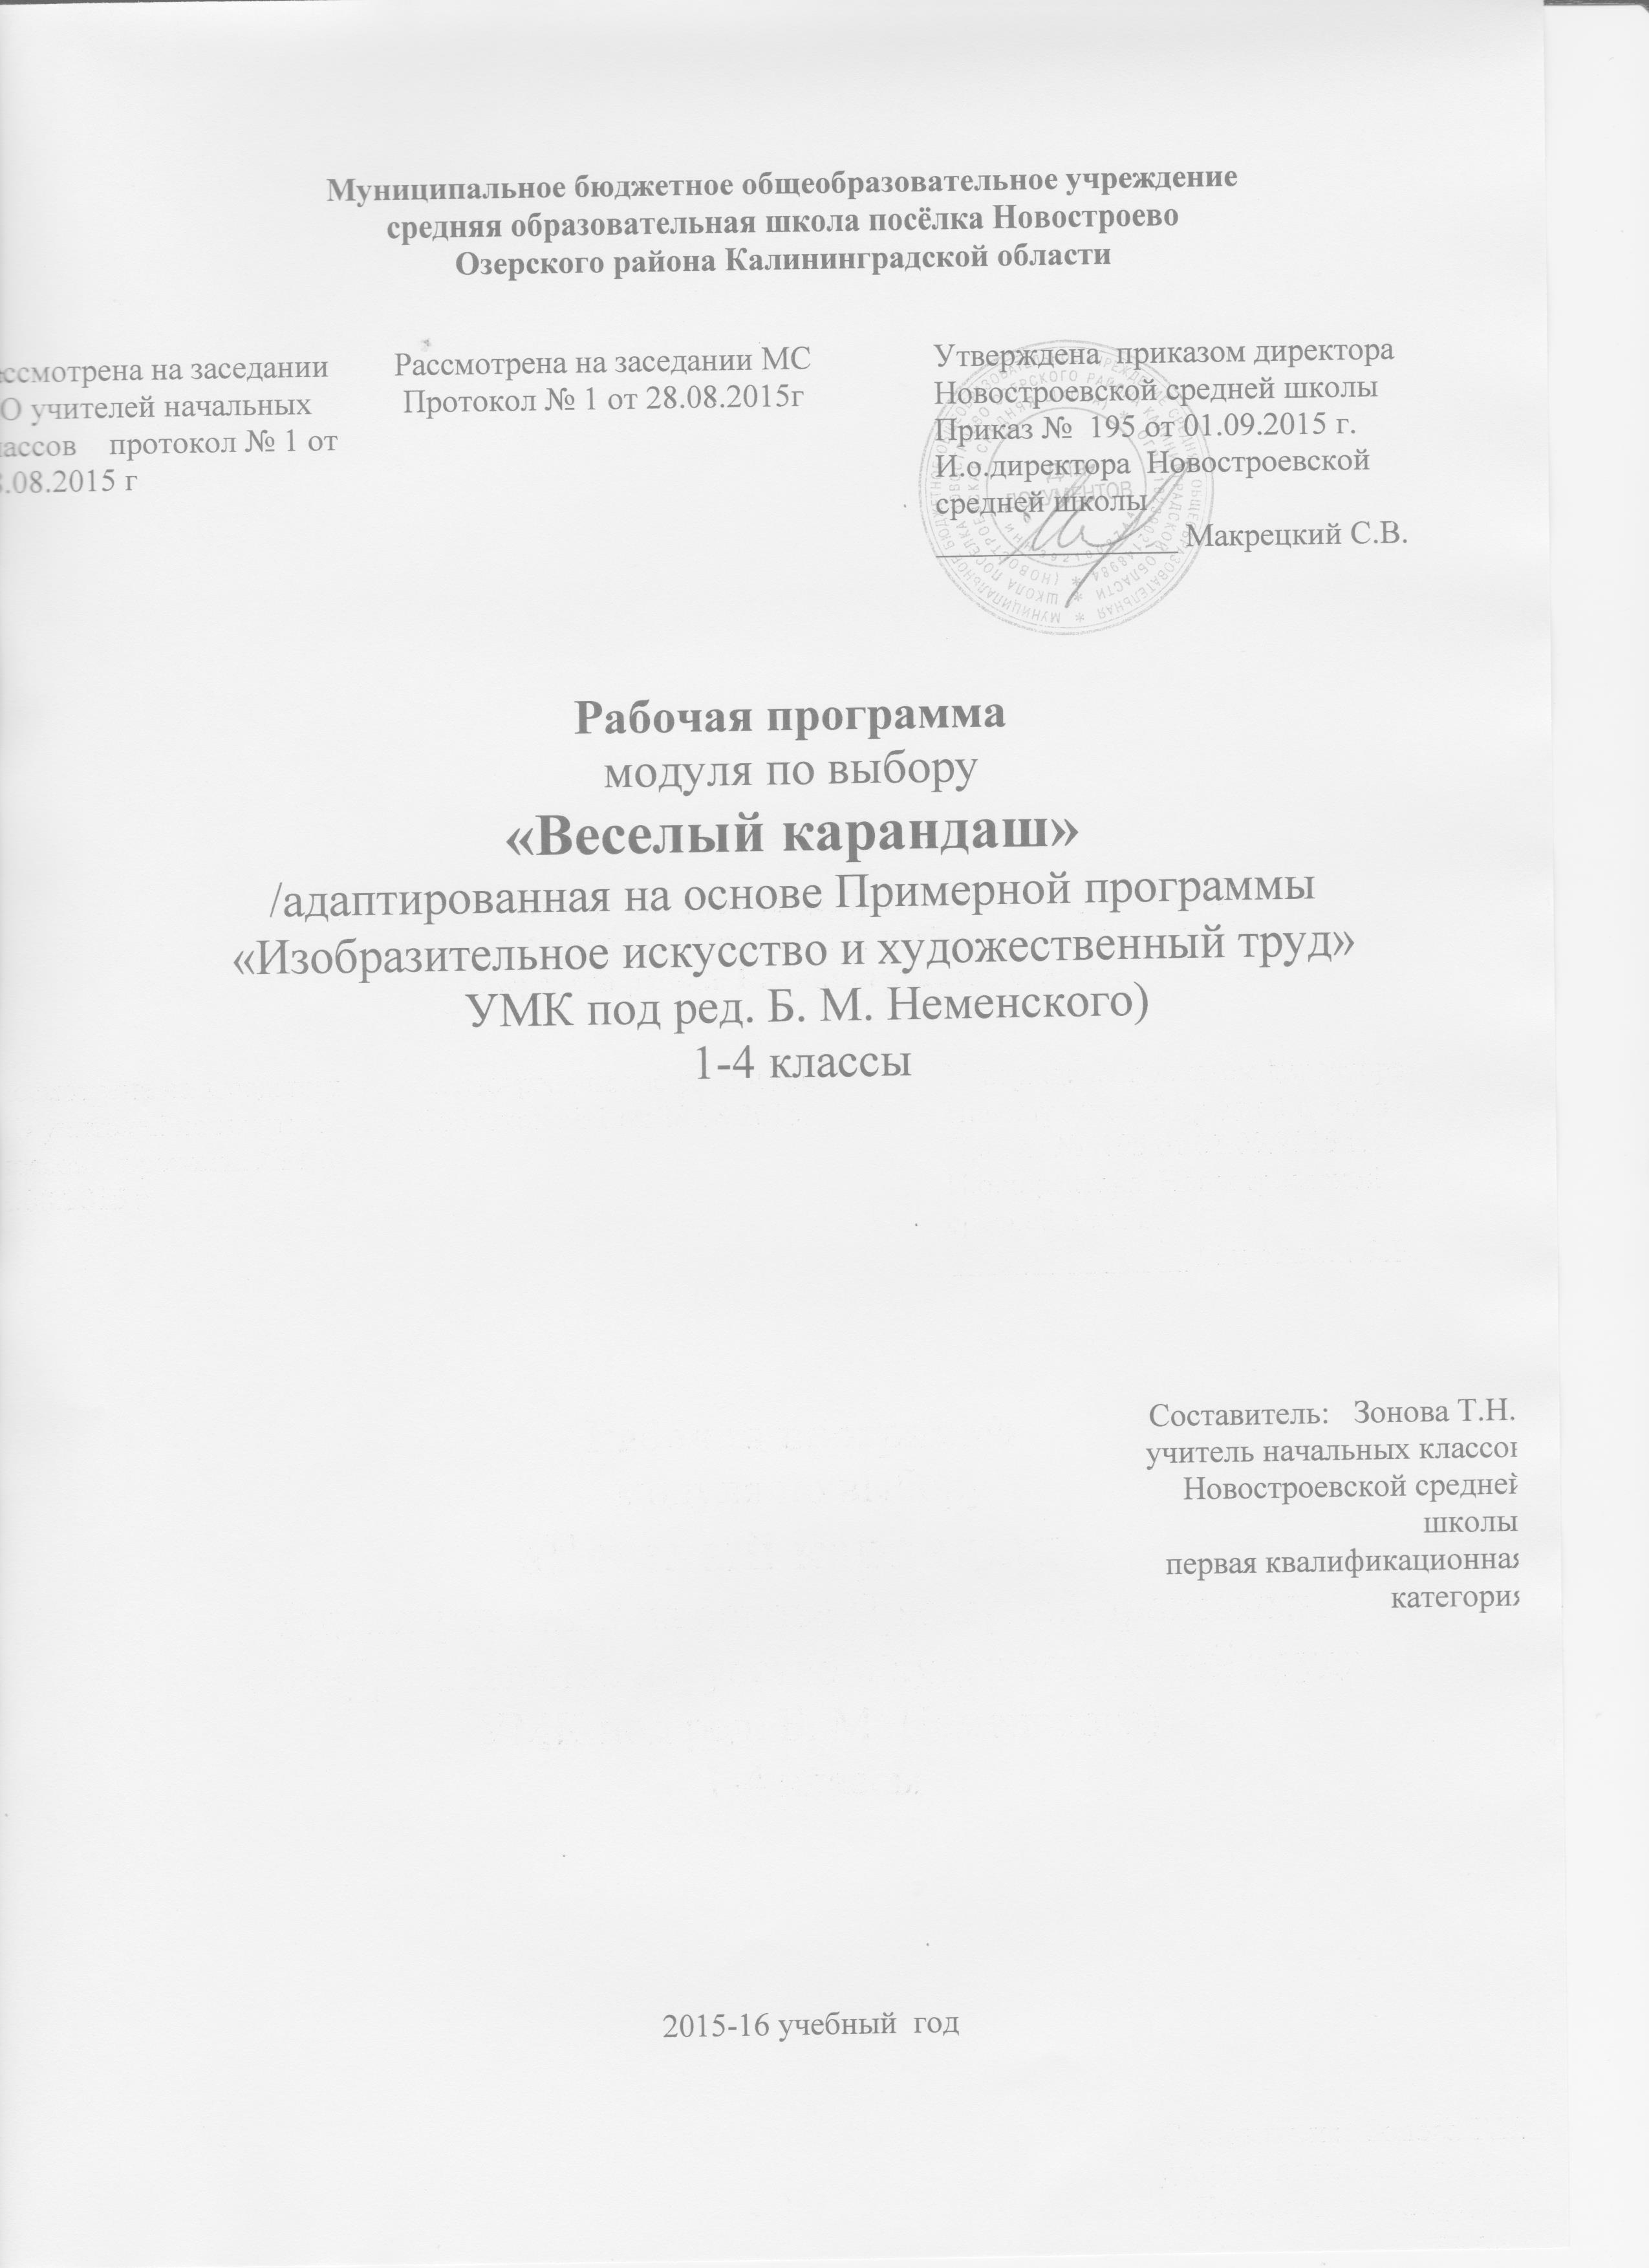 C:\Users\Дмитрий\Desktop\Scanned Documents\весел кар.jpeg